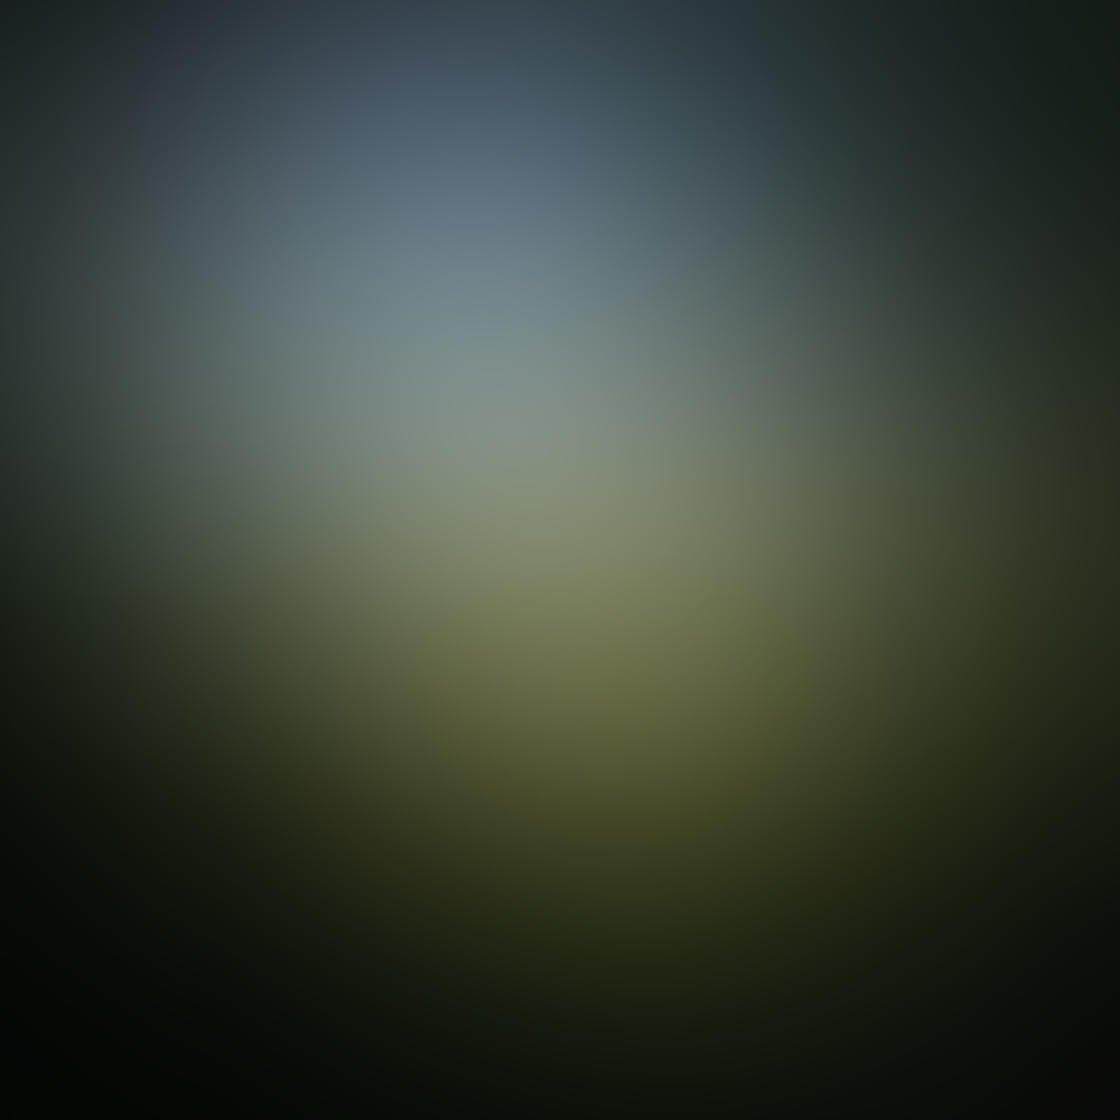 Ordinary iPhone Photo Subjects 80